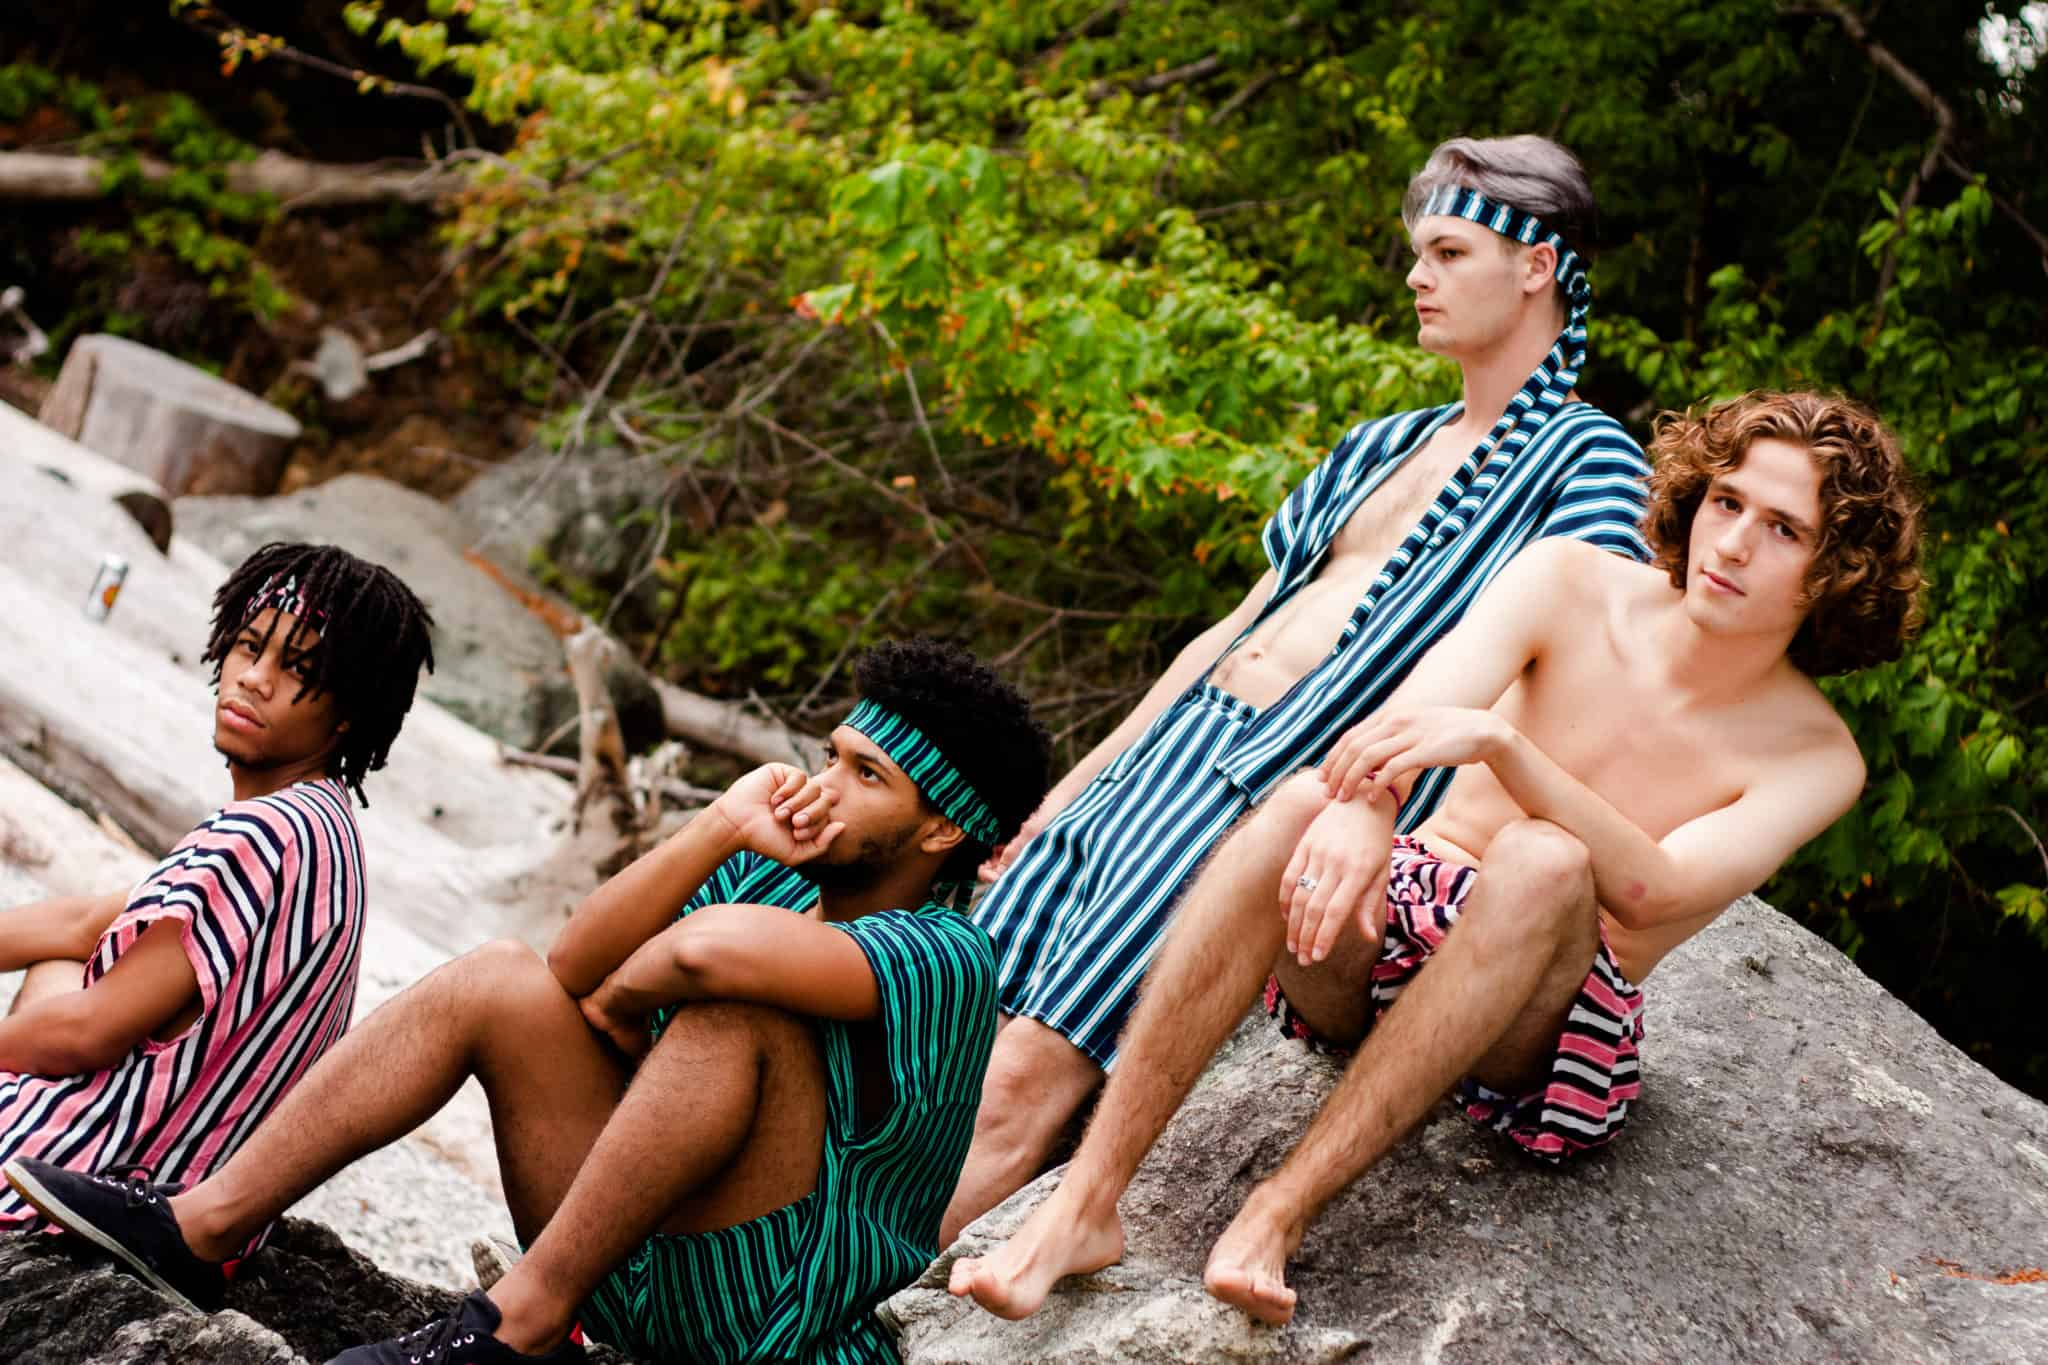 Guys Modelling TldaKimono Striped Two Pieces   Coachella Festival Fashion